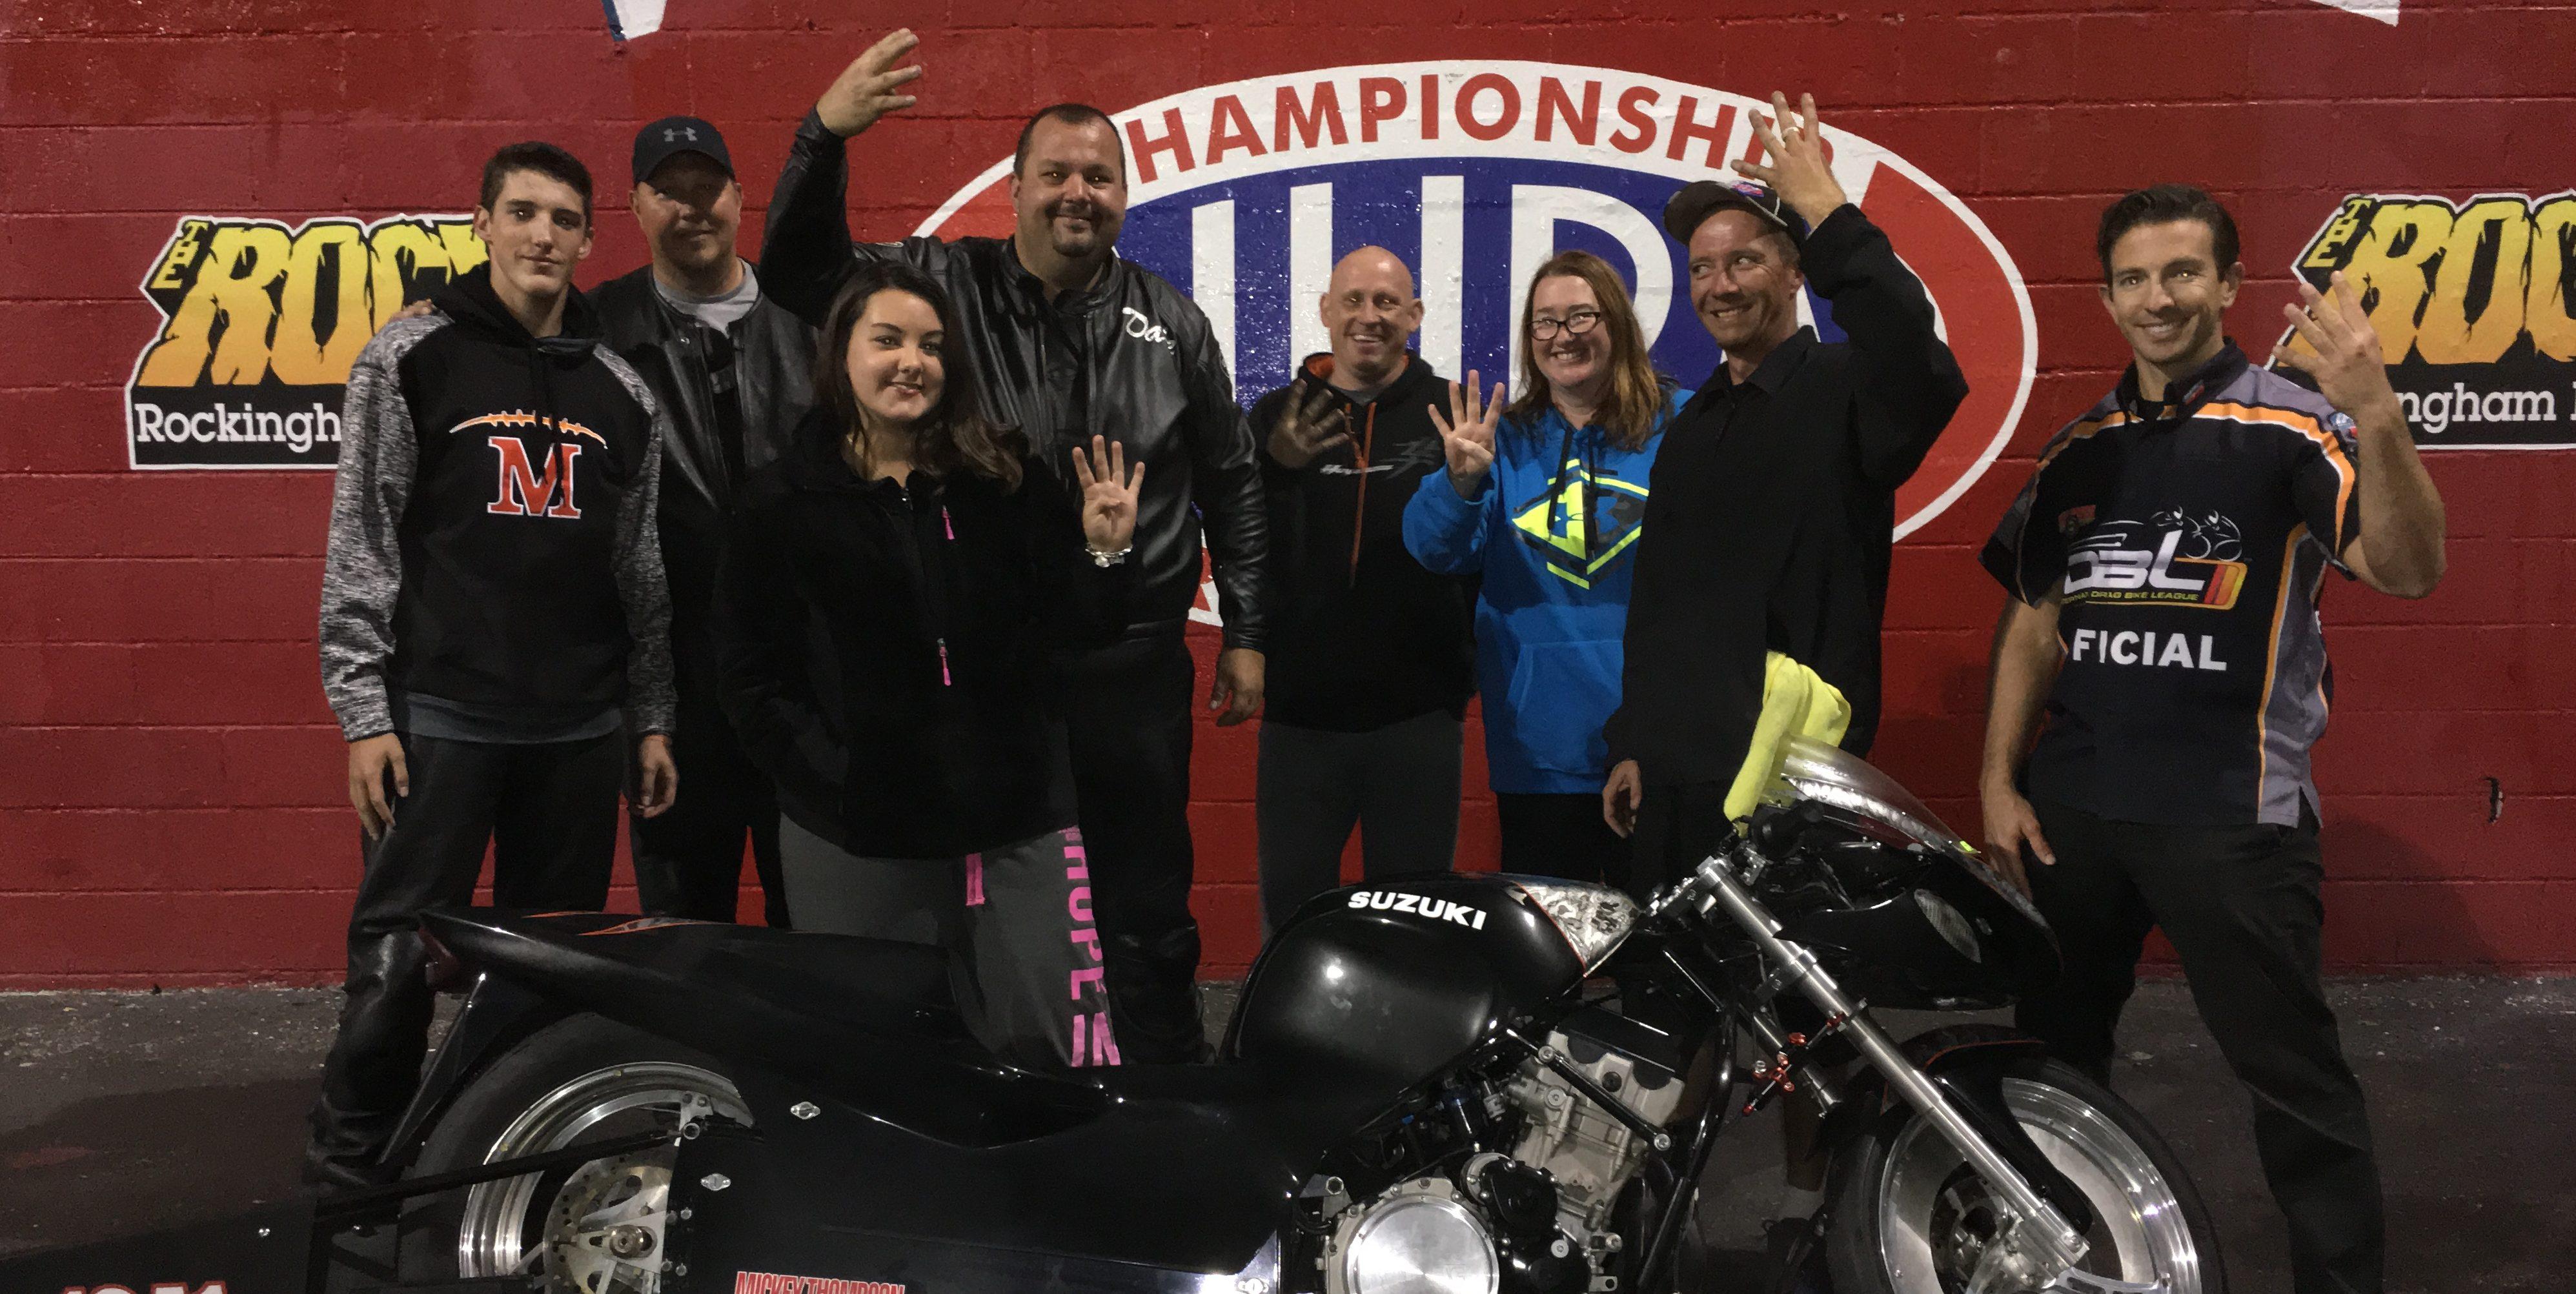 Dale Hamilton wins IDBL Finals